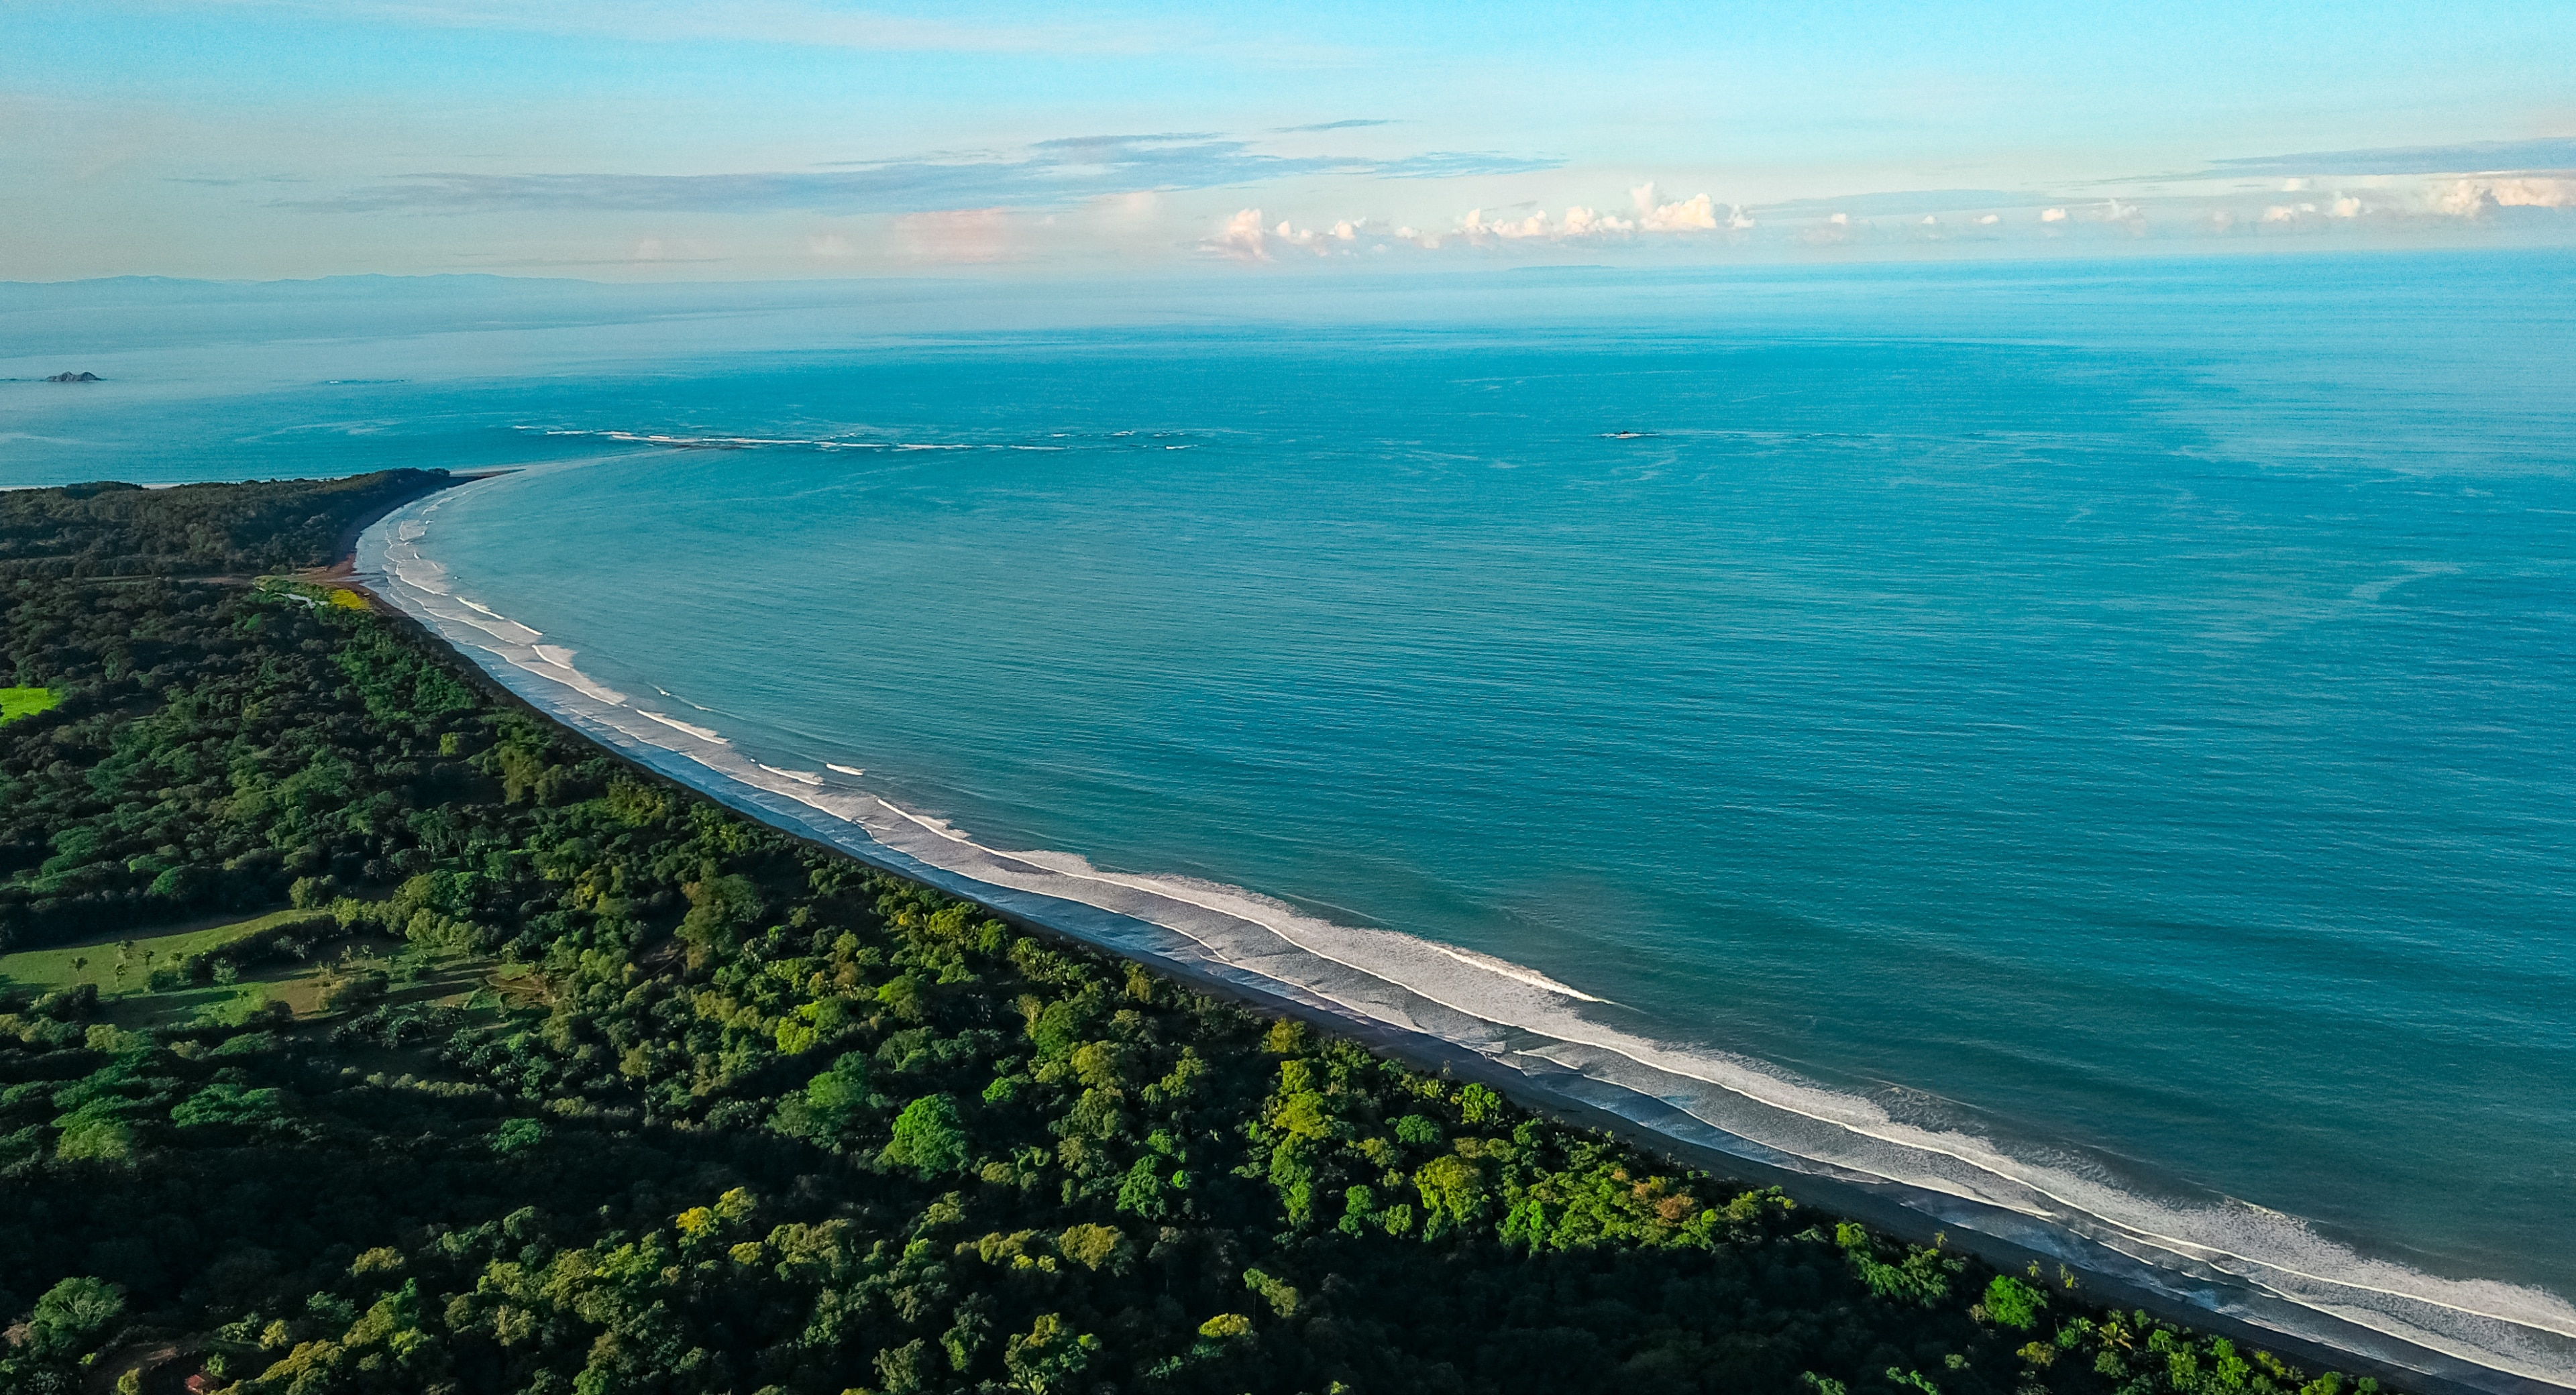 Ballena, Puntarenas Province, Costa Rica